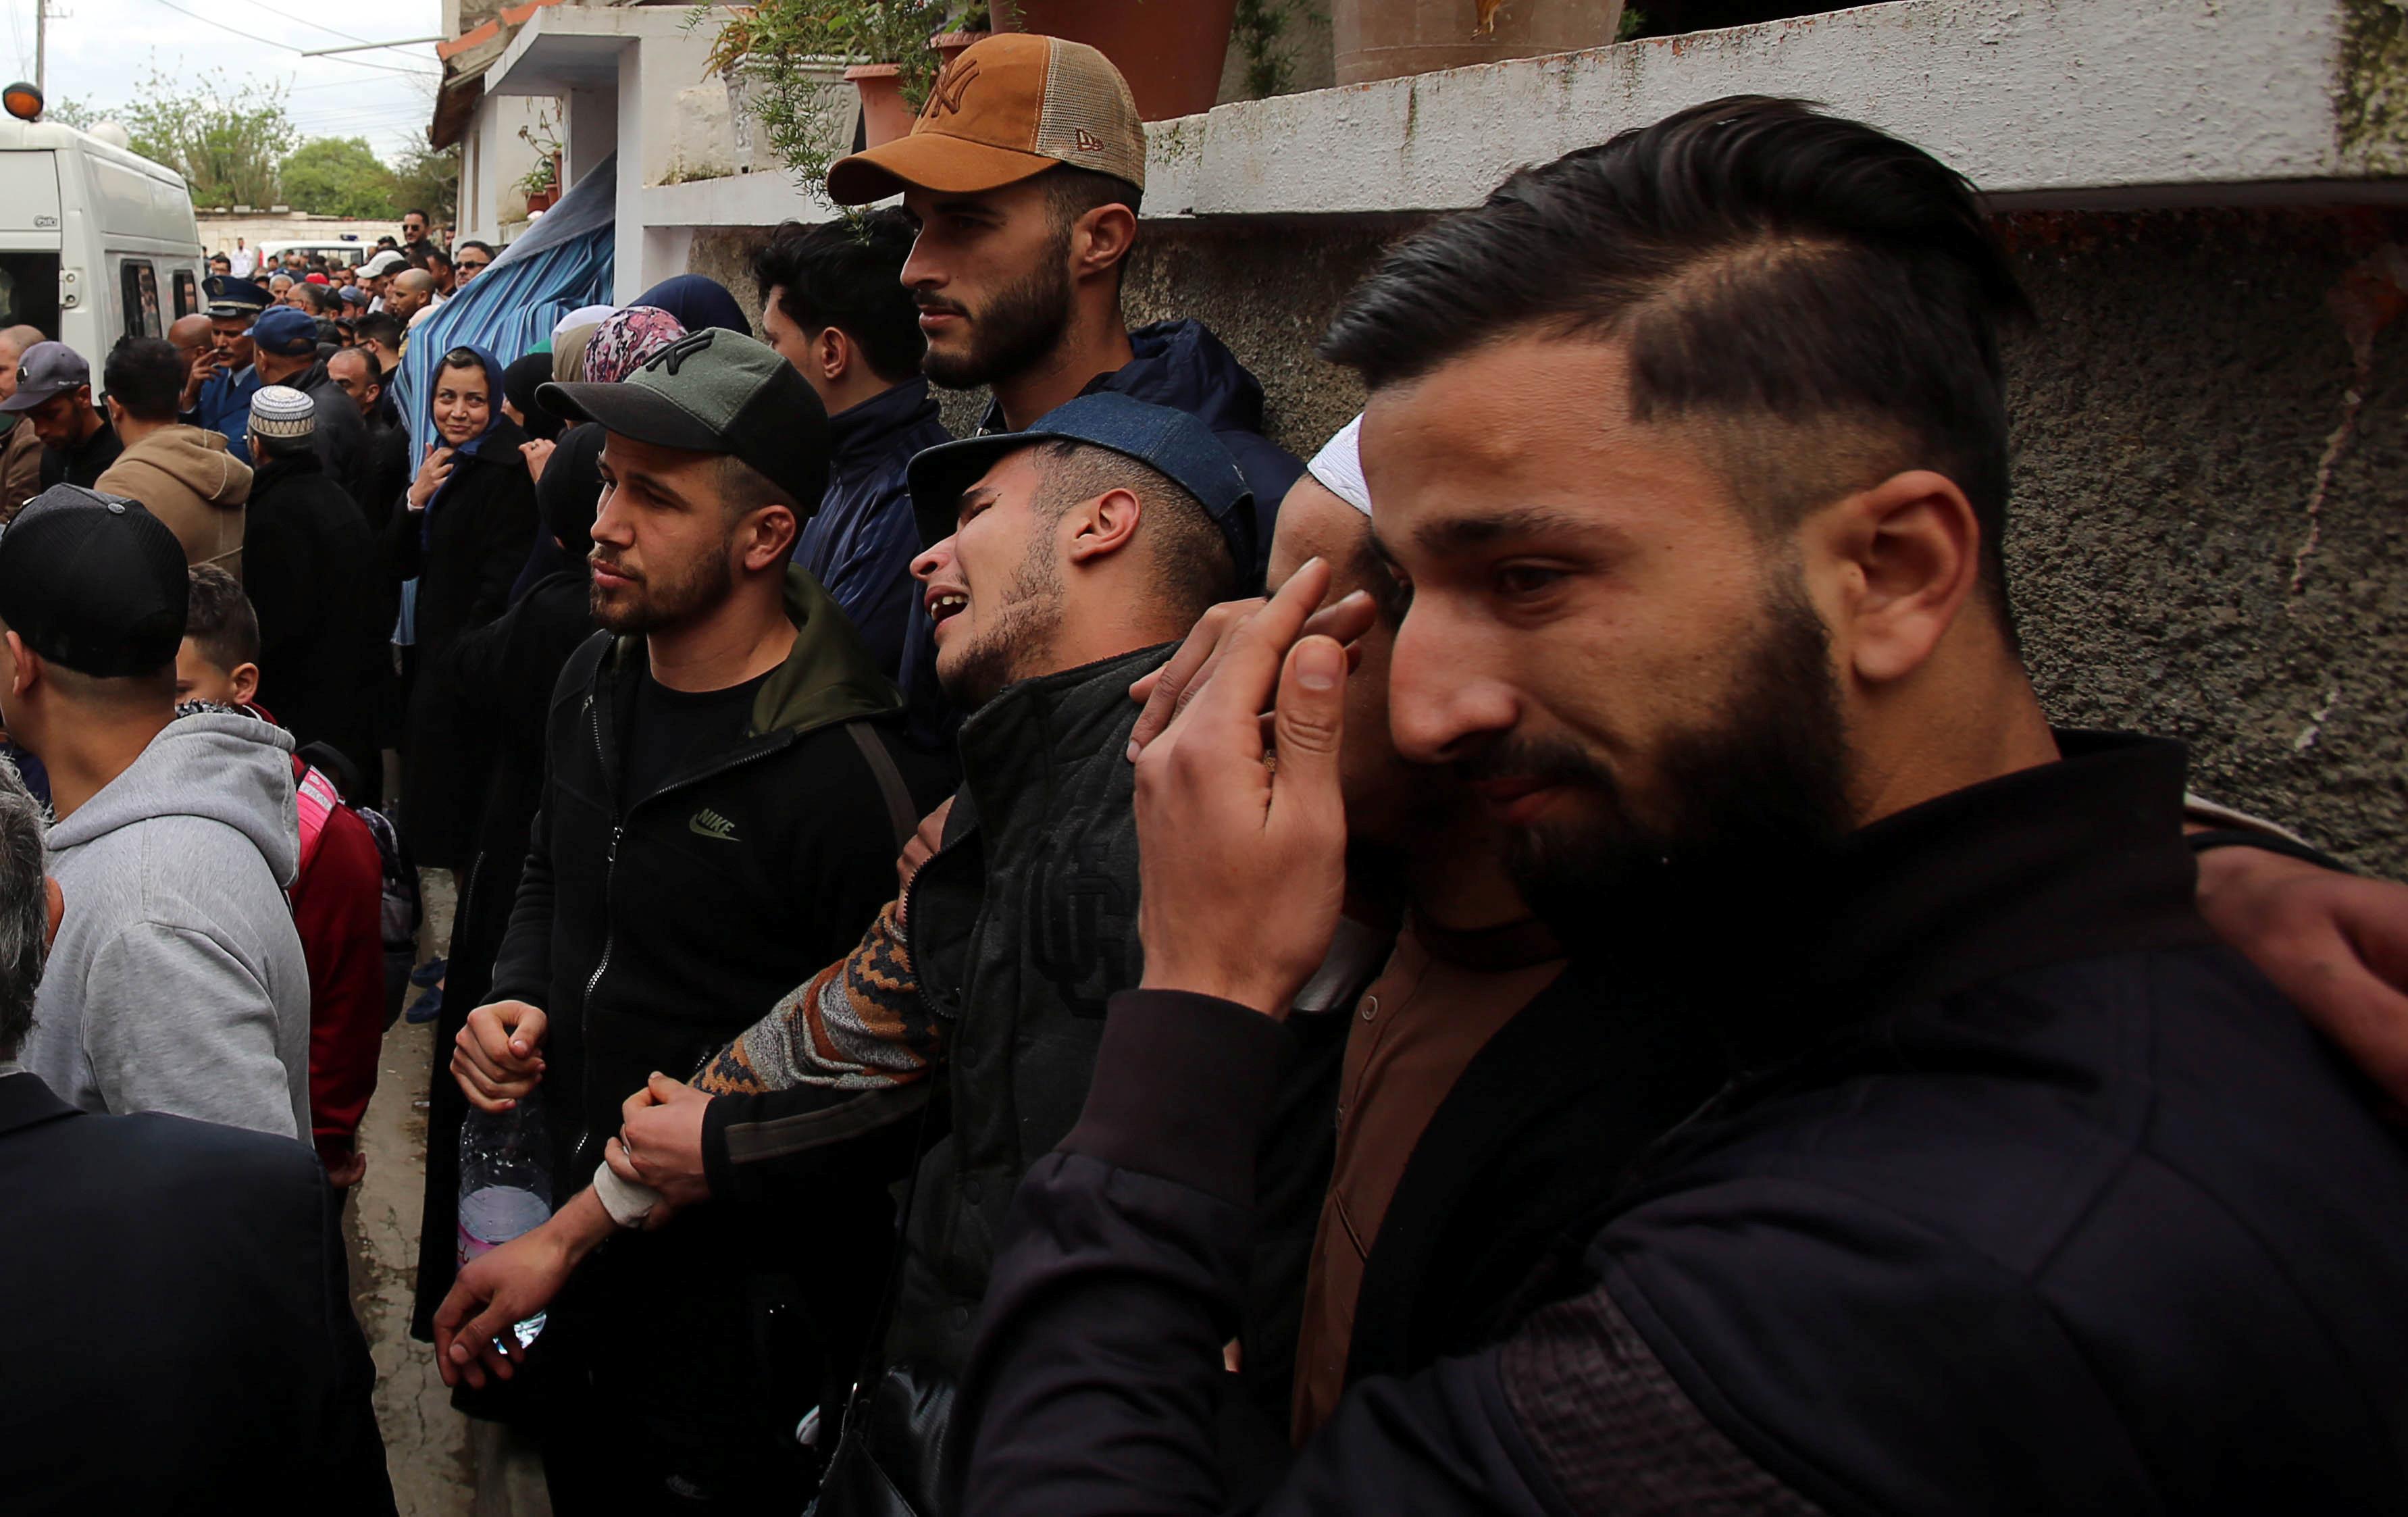 جزائريون يشيعون جثمان ضحايا الطائرة